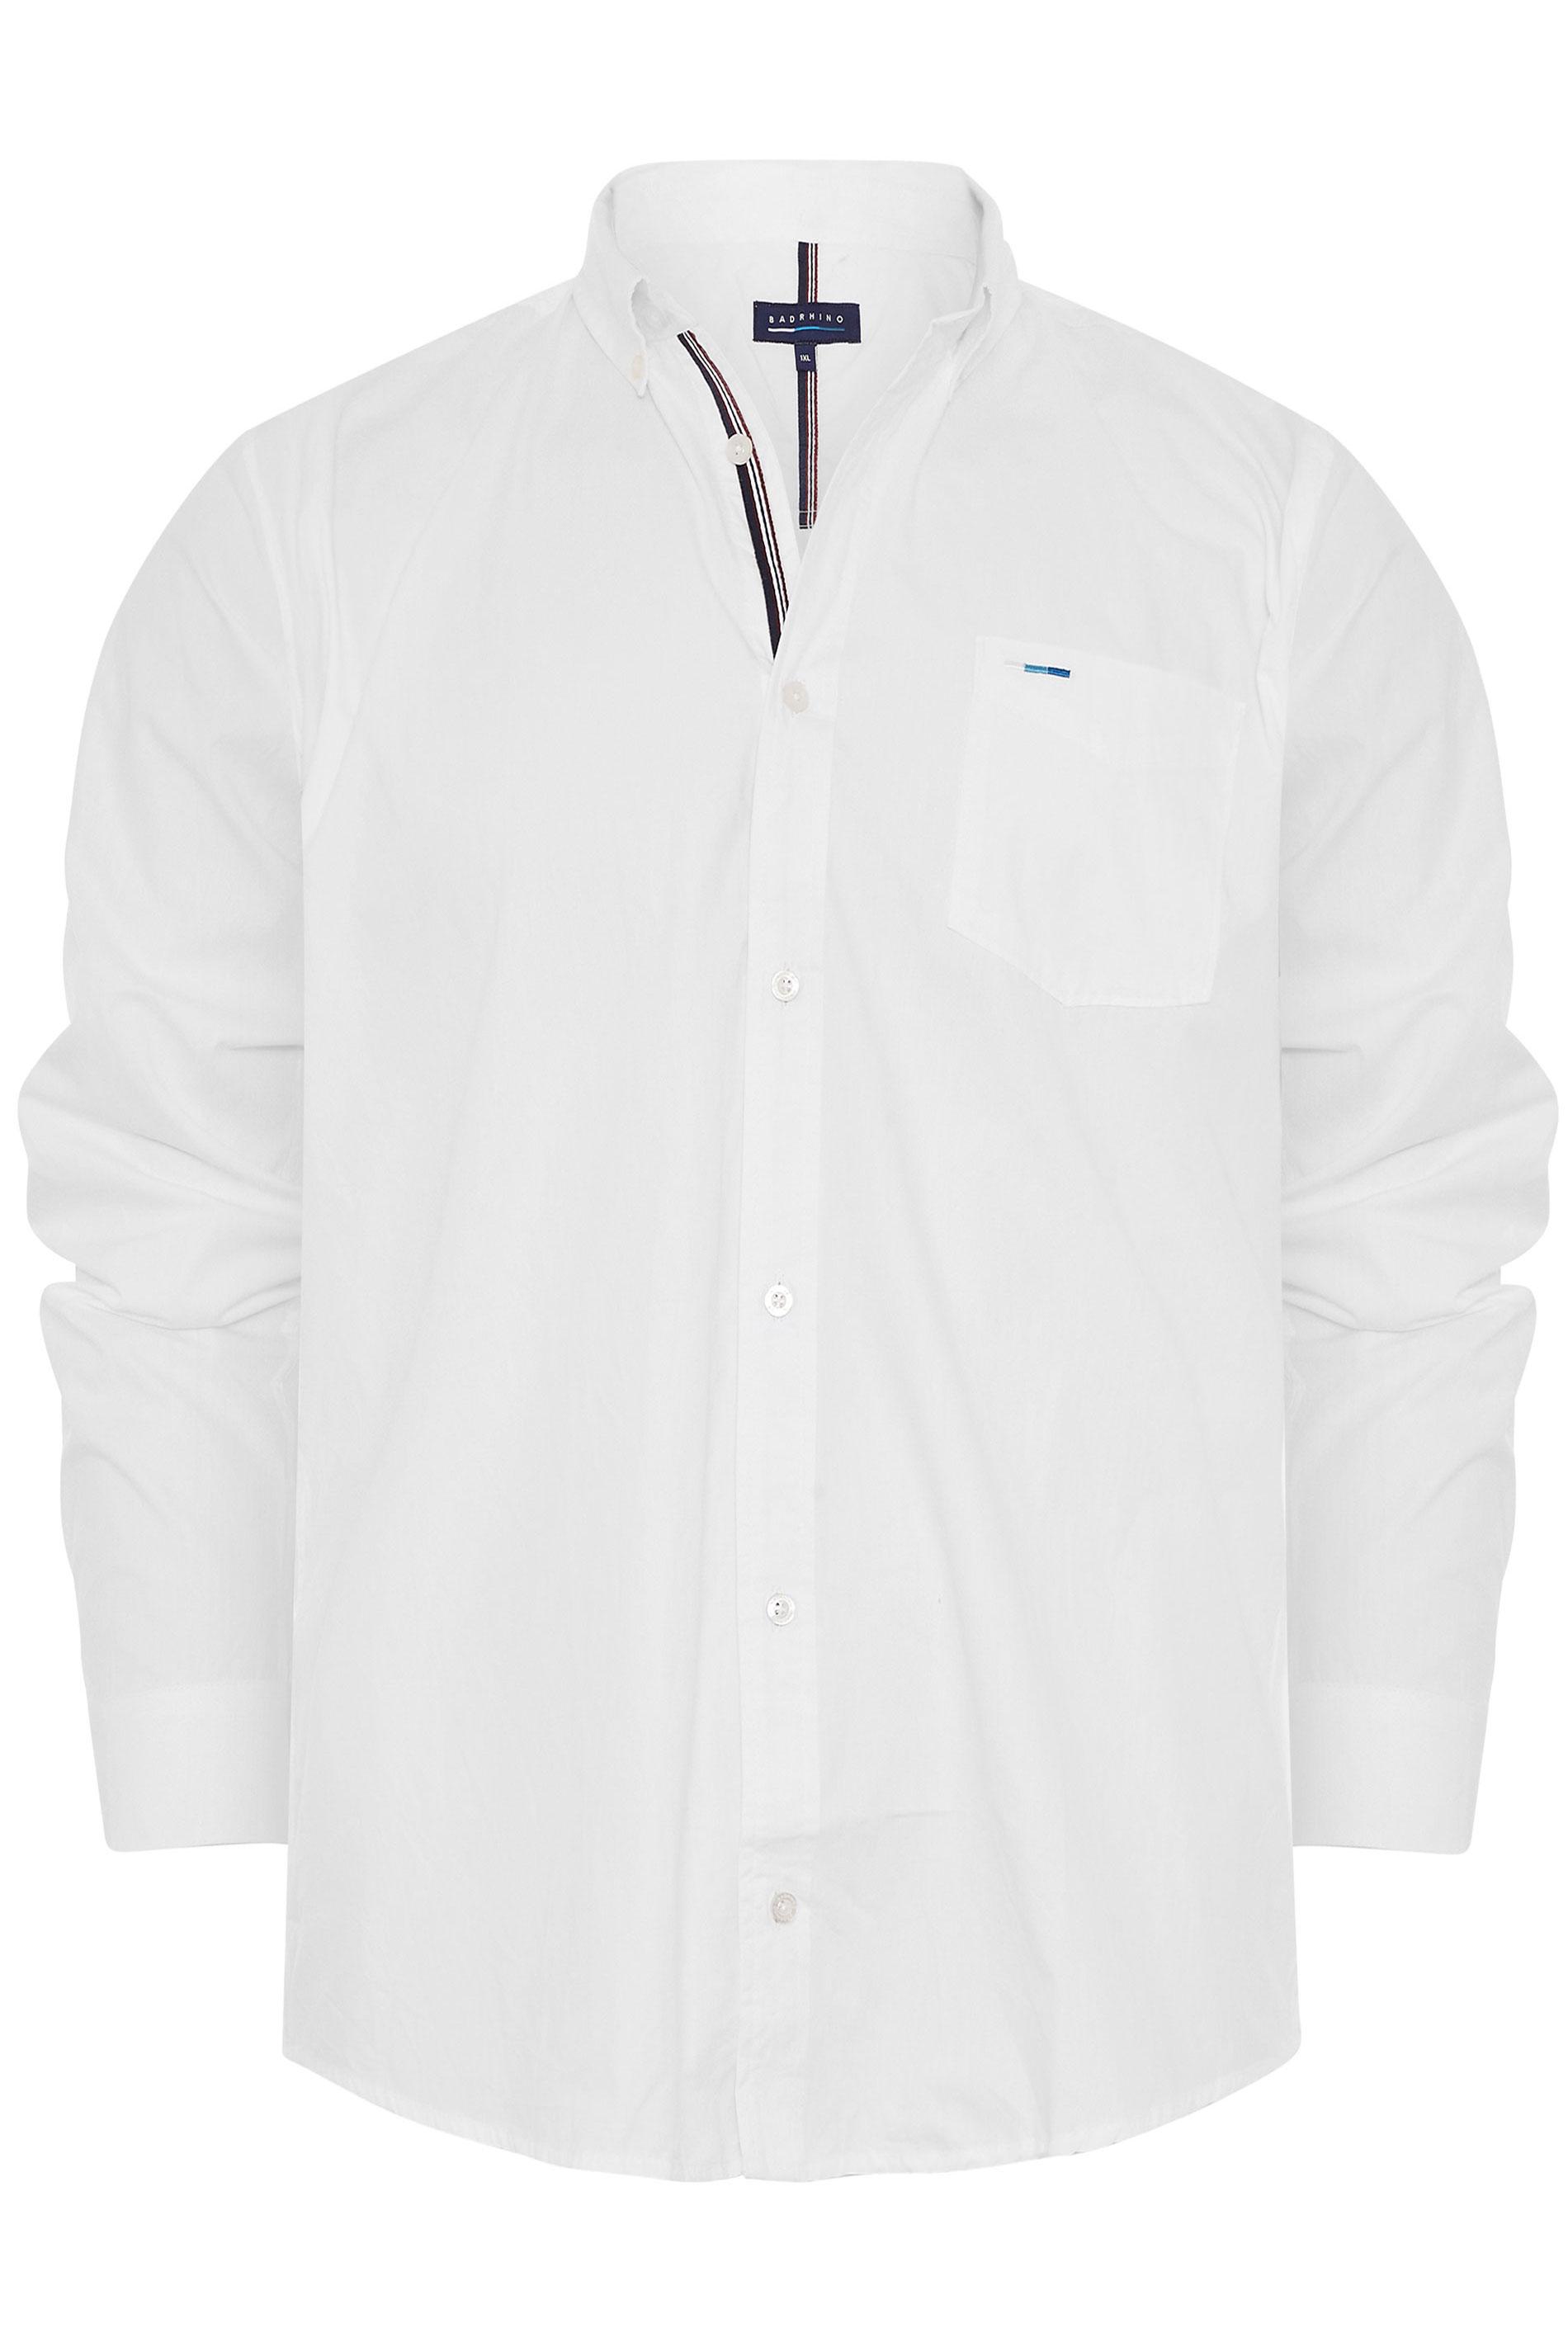 BadRhino White Cotton Poplin Long Sleeve Shirt_F.jpg